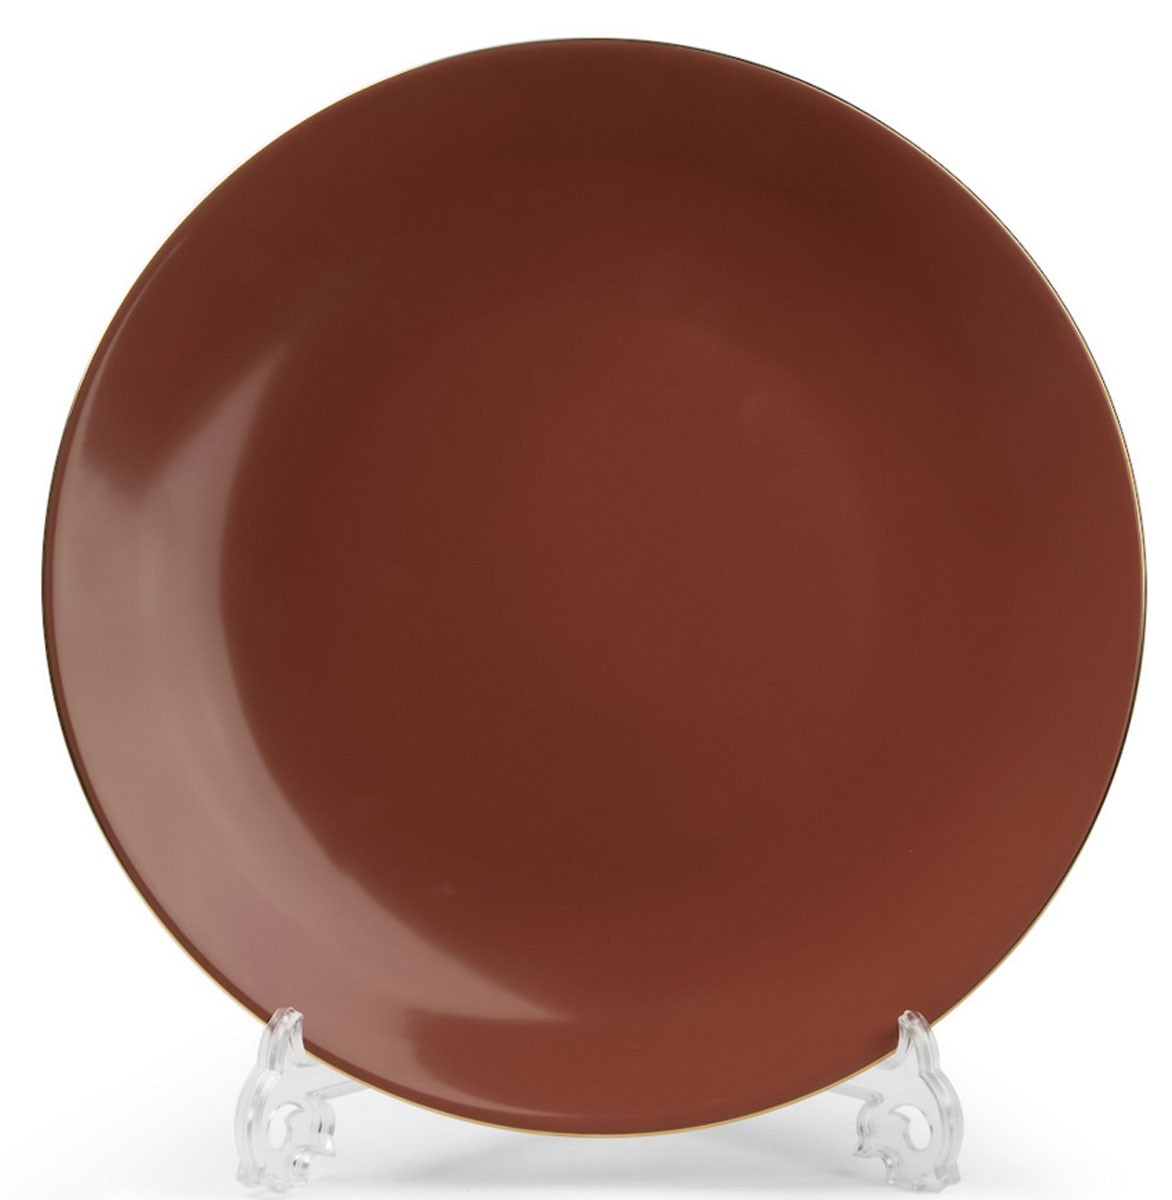 Monalisa 3126 набор тарелок 27 см*6 шт, цвет: мокко с золотом7290063126В наборе тарелка 27 см 6 штук Материал: фарфор: цвет: мокко с золотомСерия: MONALISA